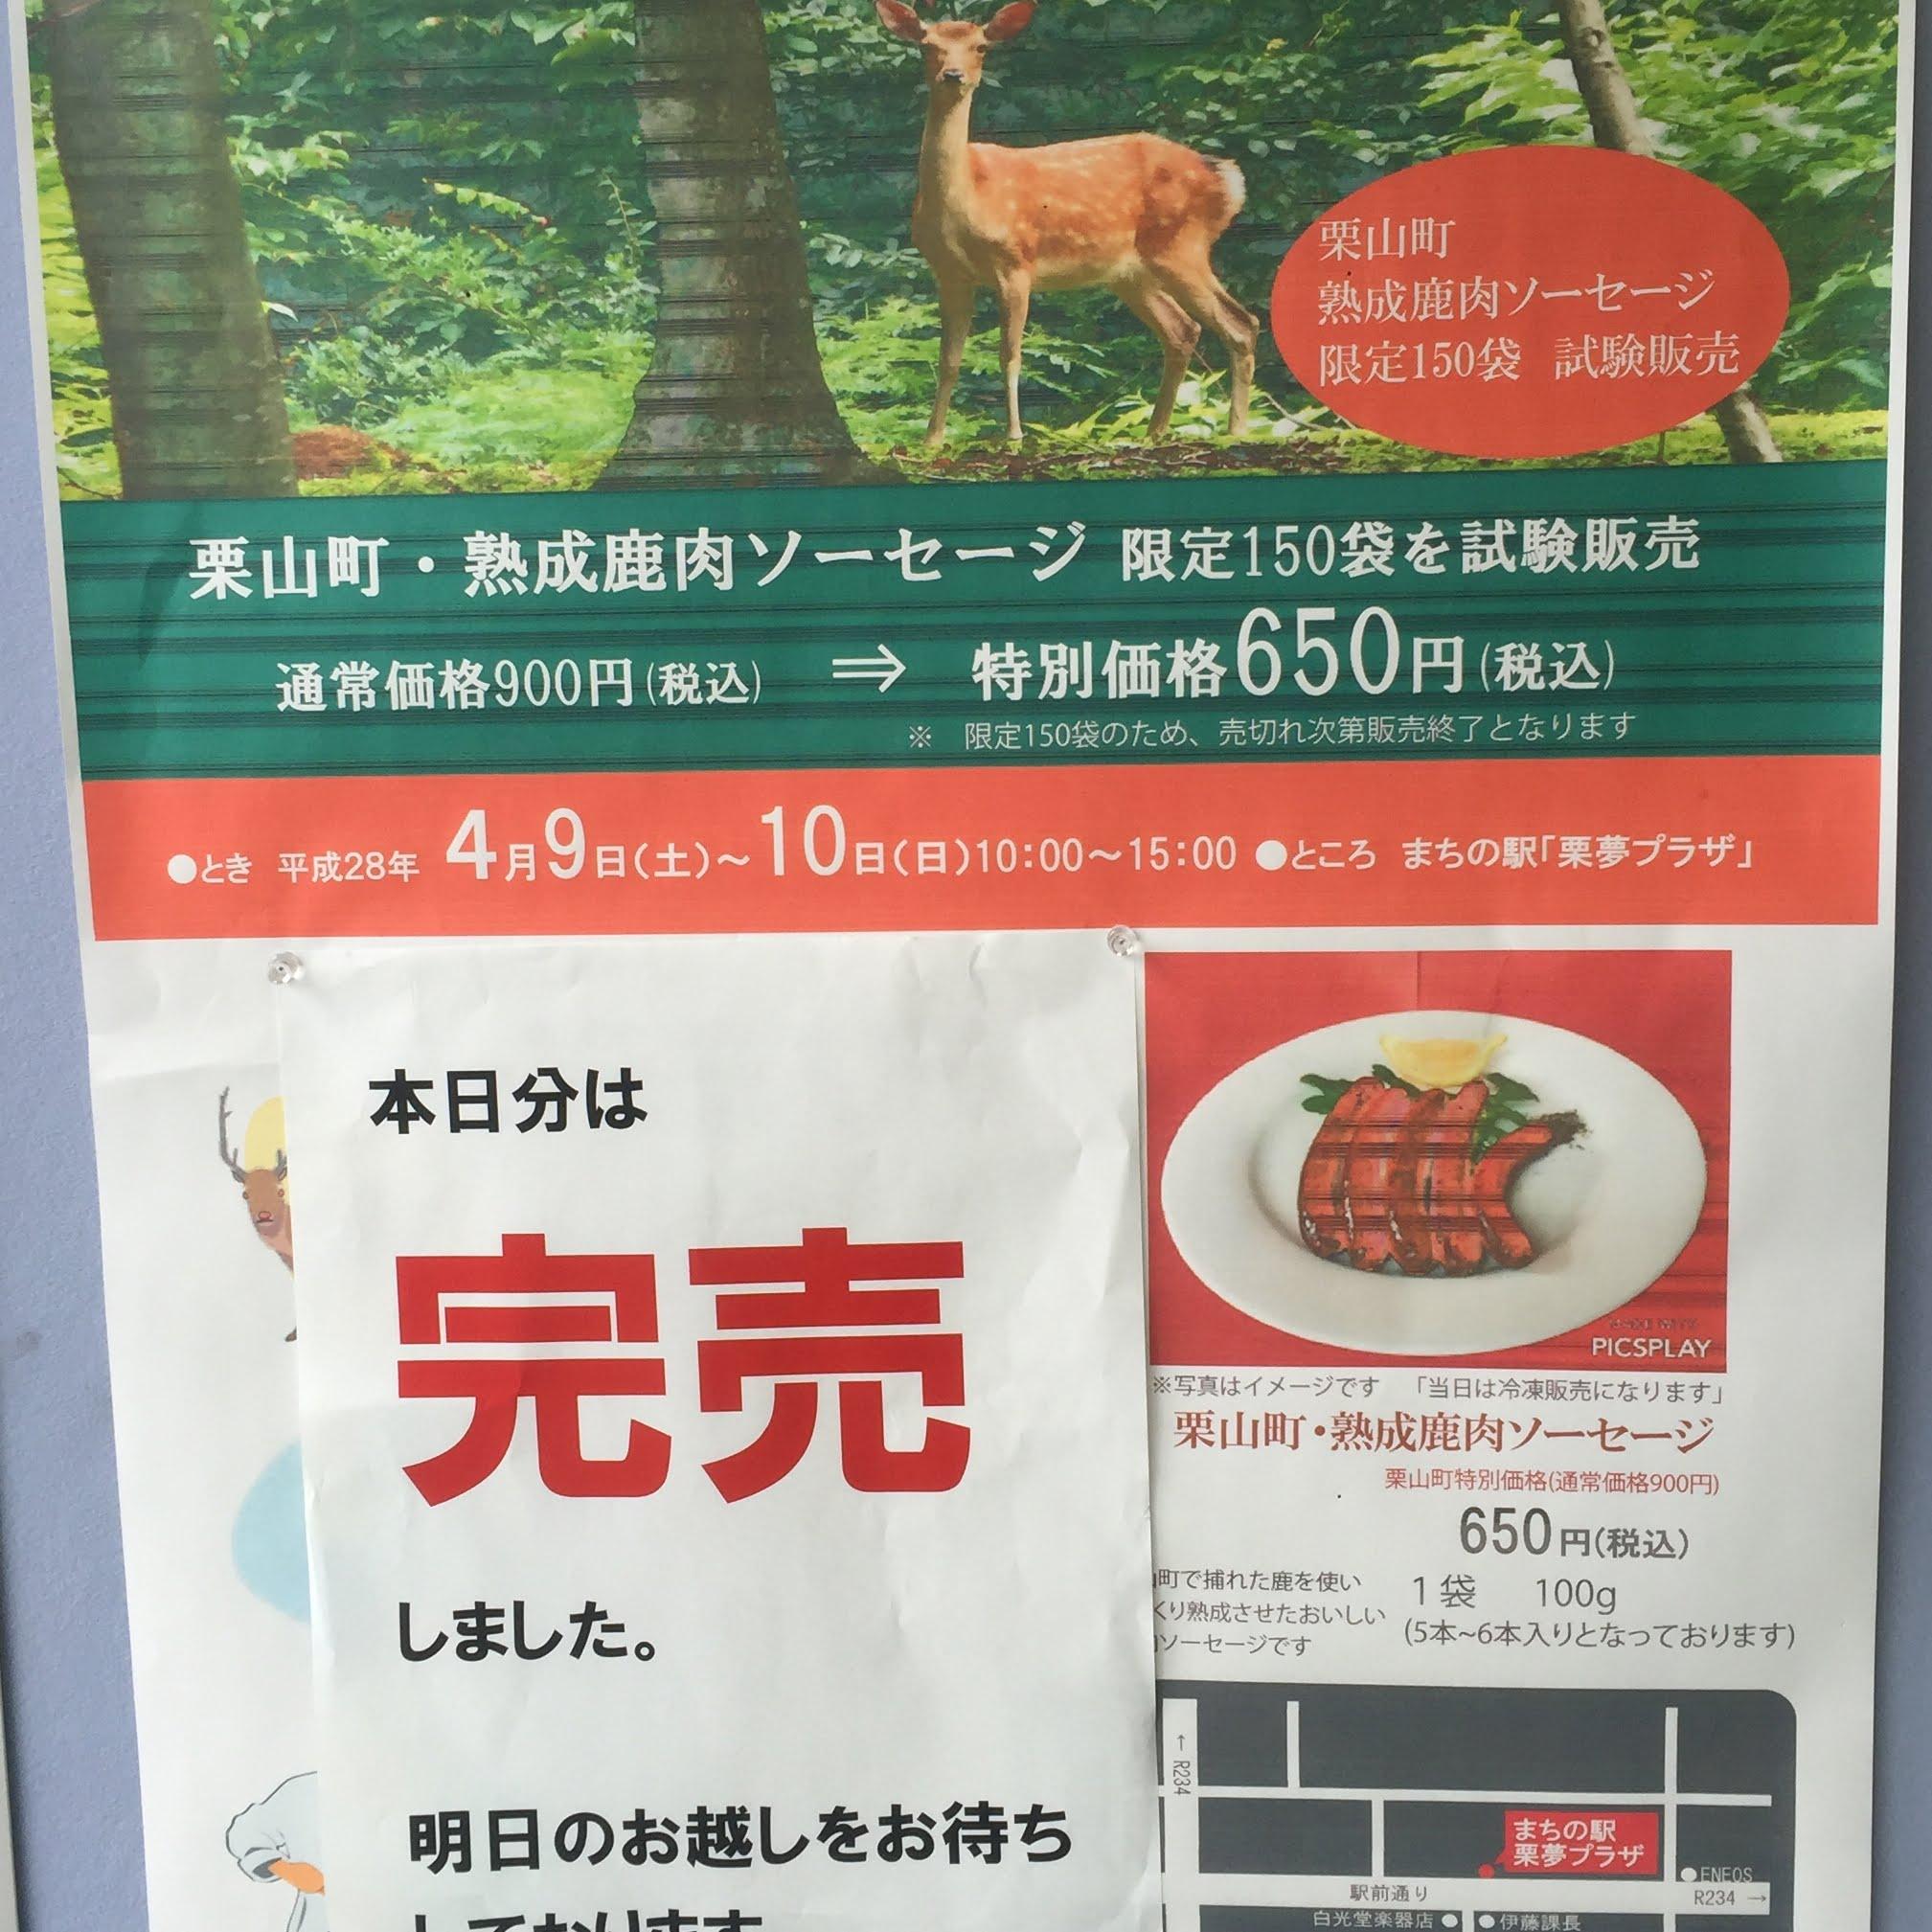 栗山町熟成鹿肉ソーセージ完売[2016年4月]